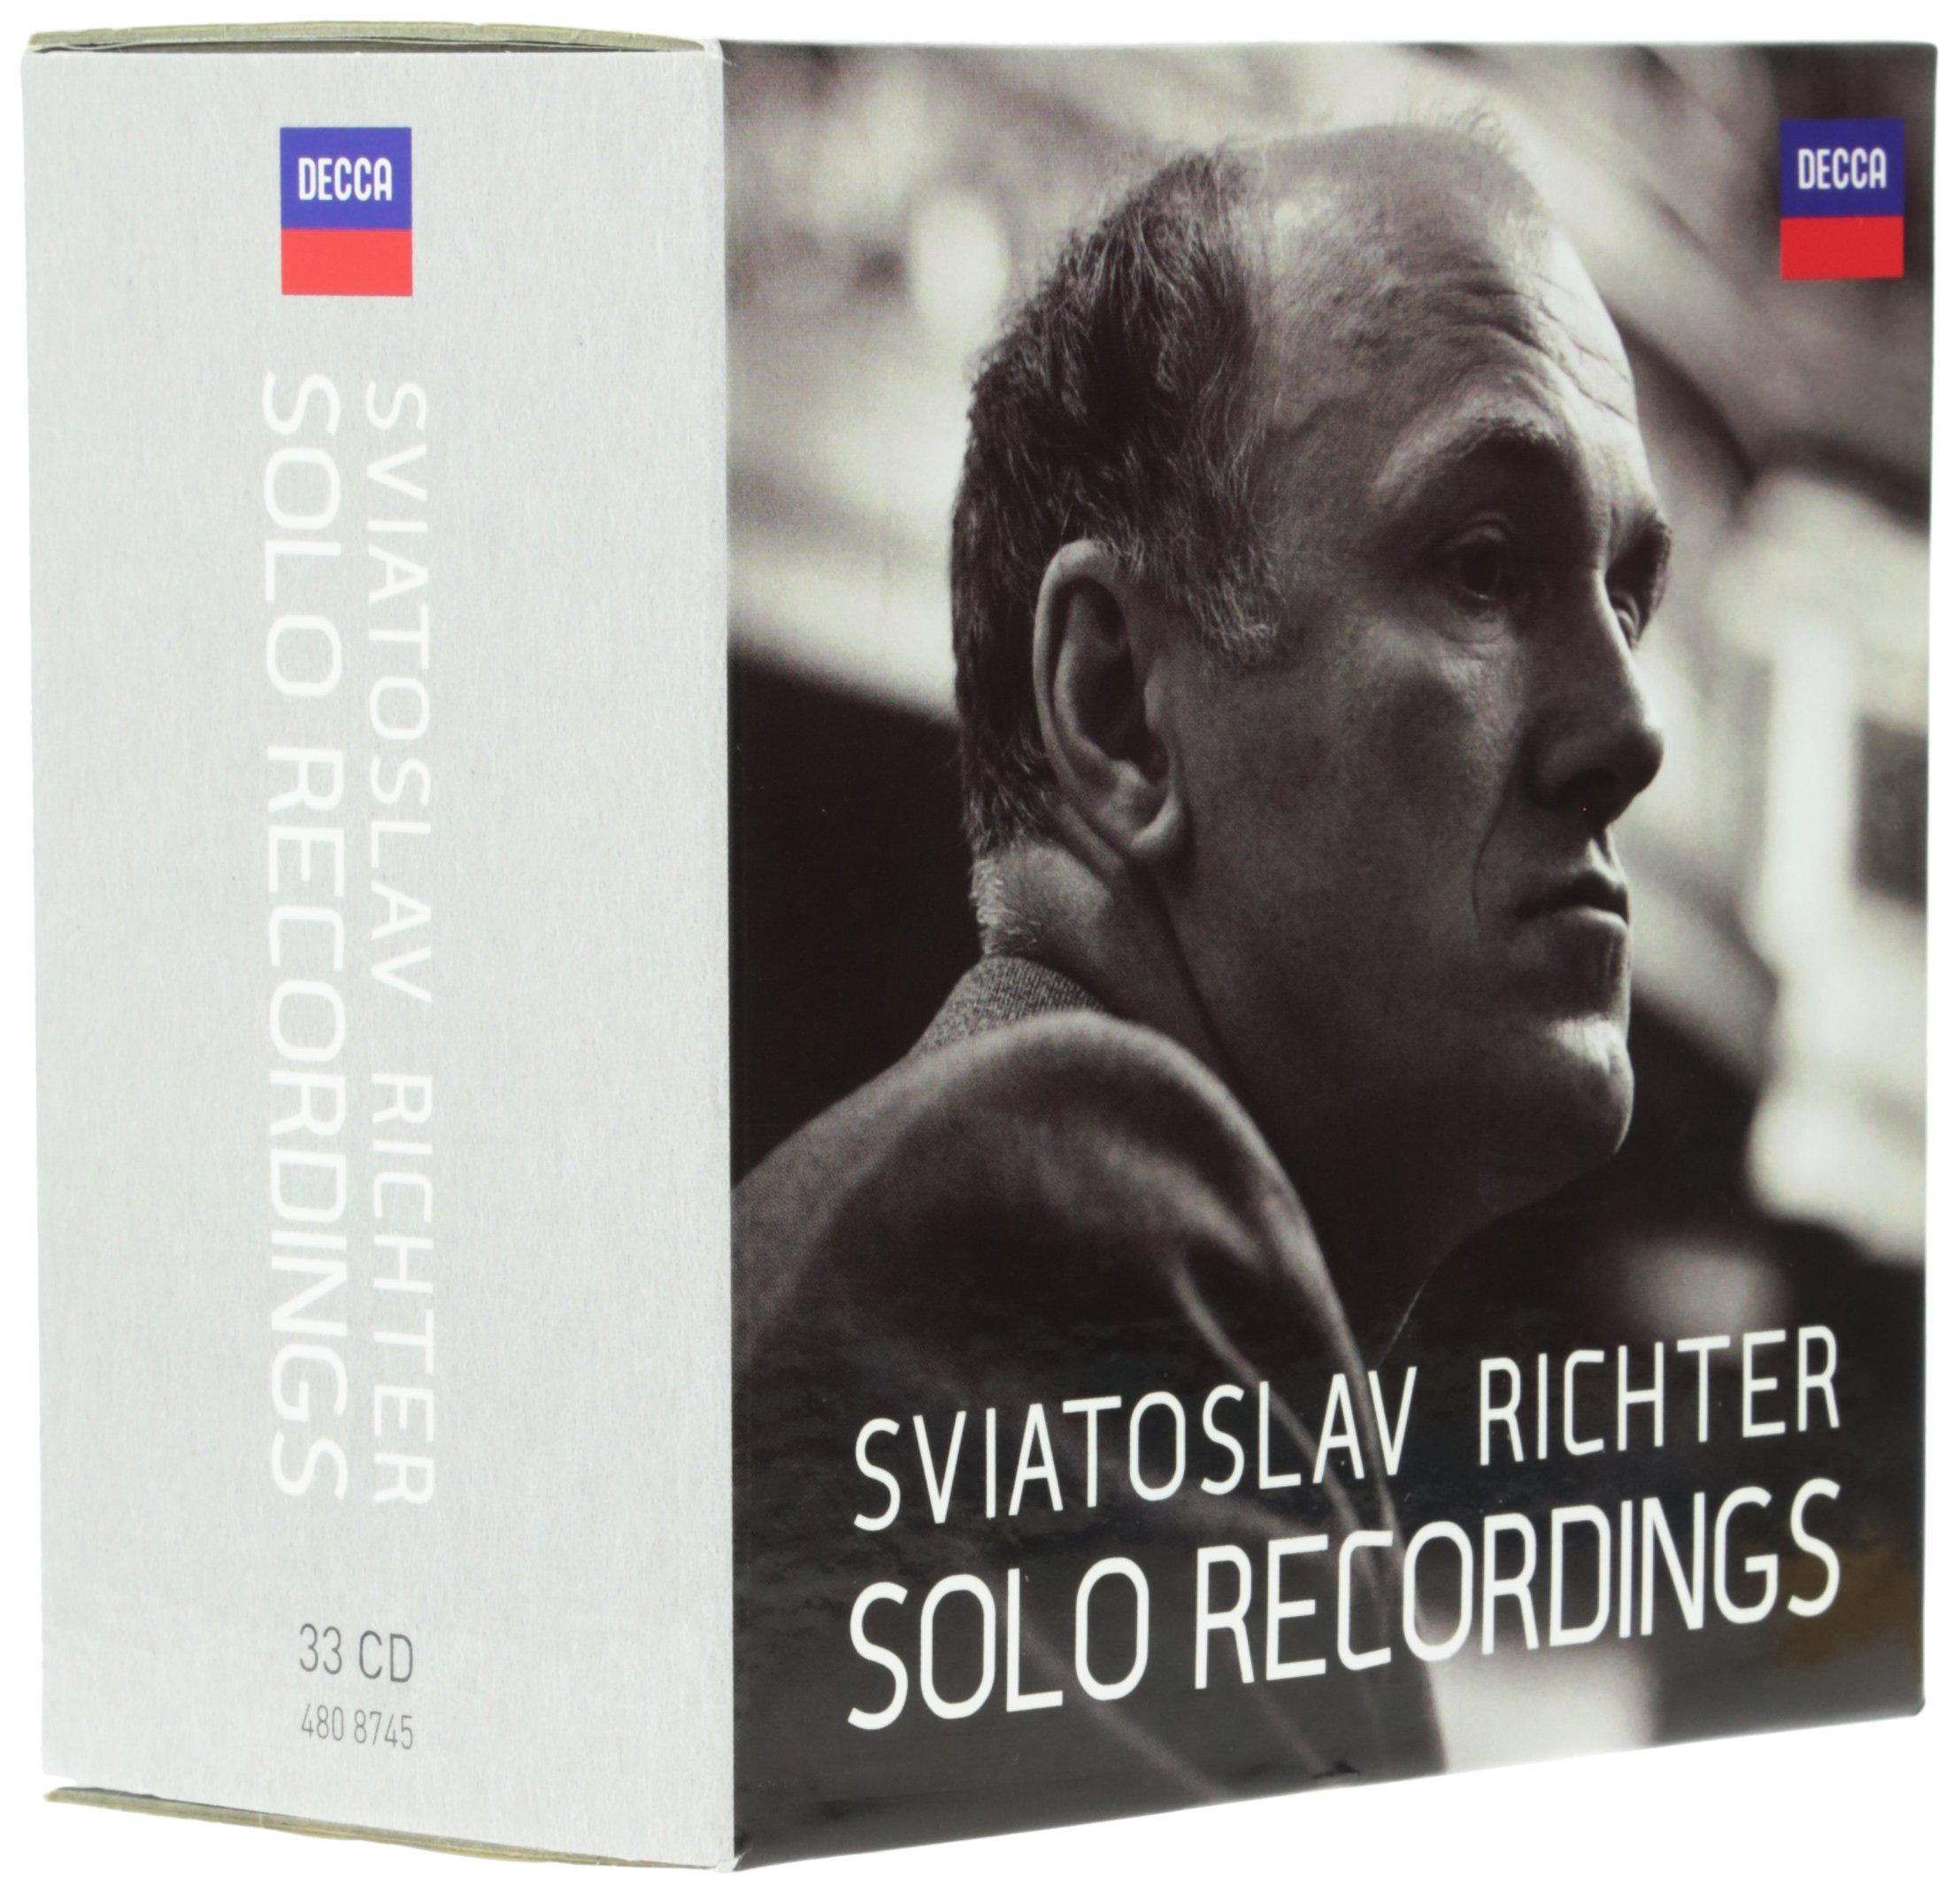 Sviatoslav RICHTER - Page 7 81Vs9f9rHxL